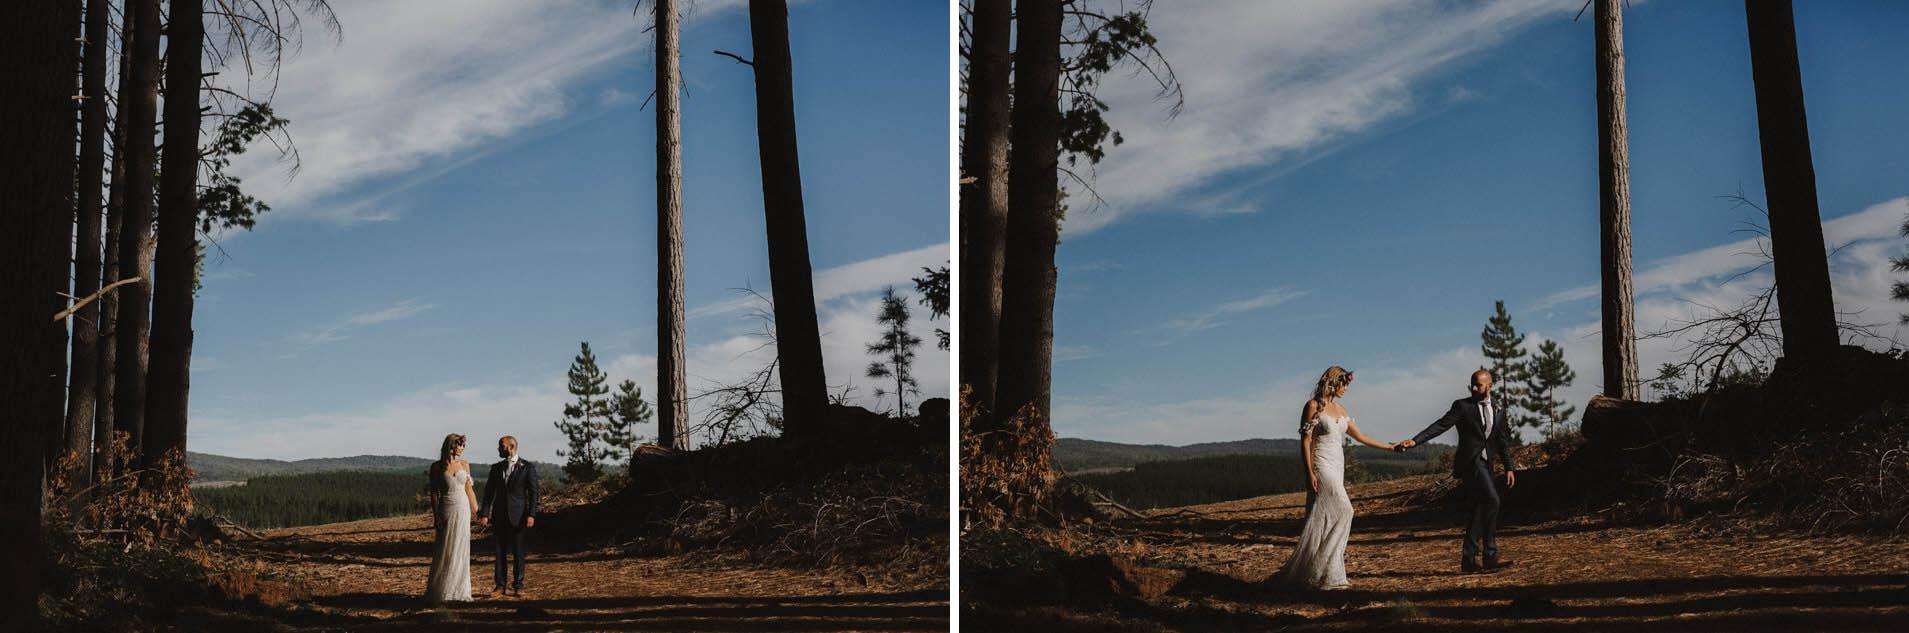 suger-pine-walk-wedding (Corinna & Dylan)_177(2242)2.jpg